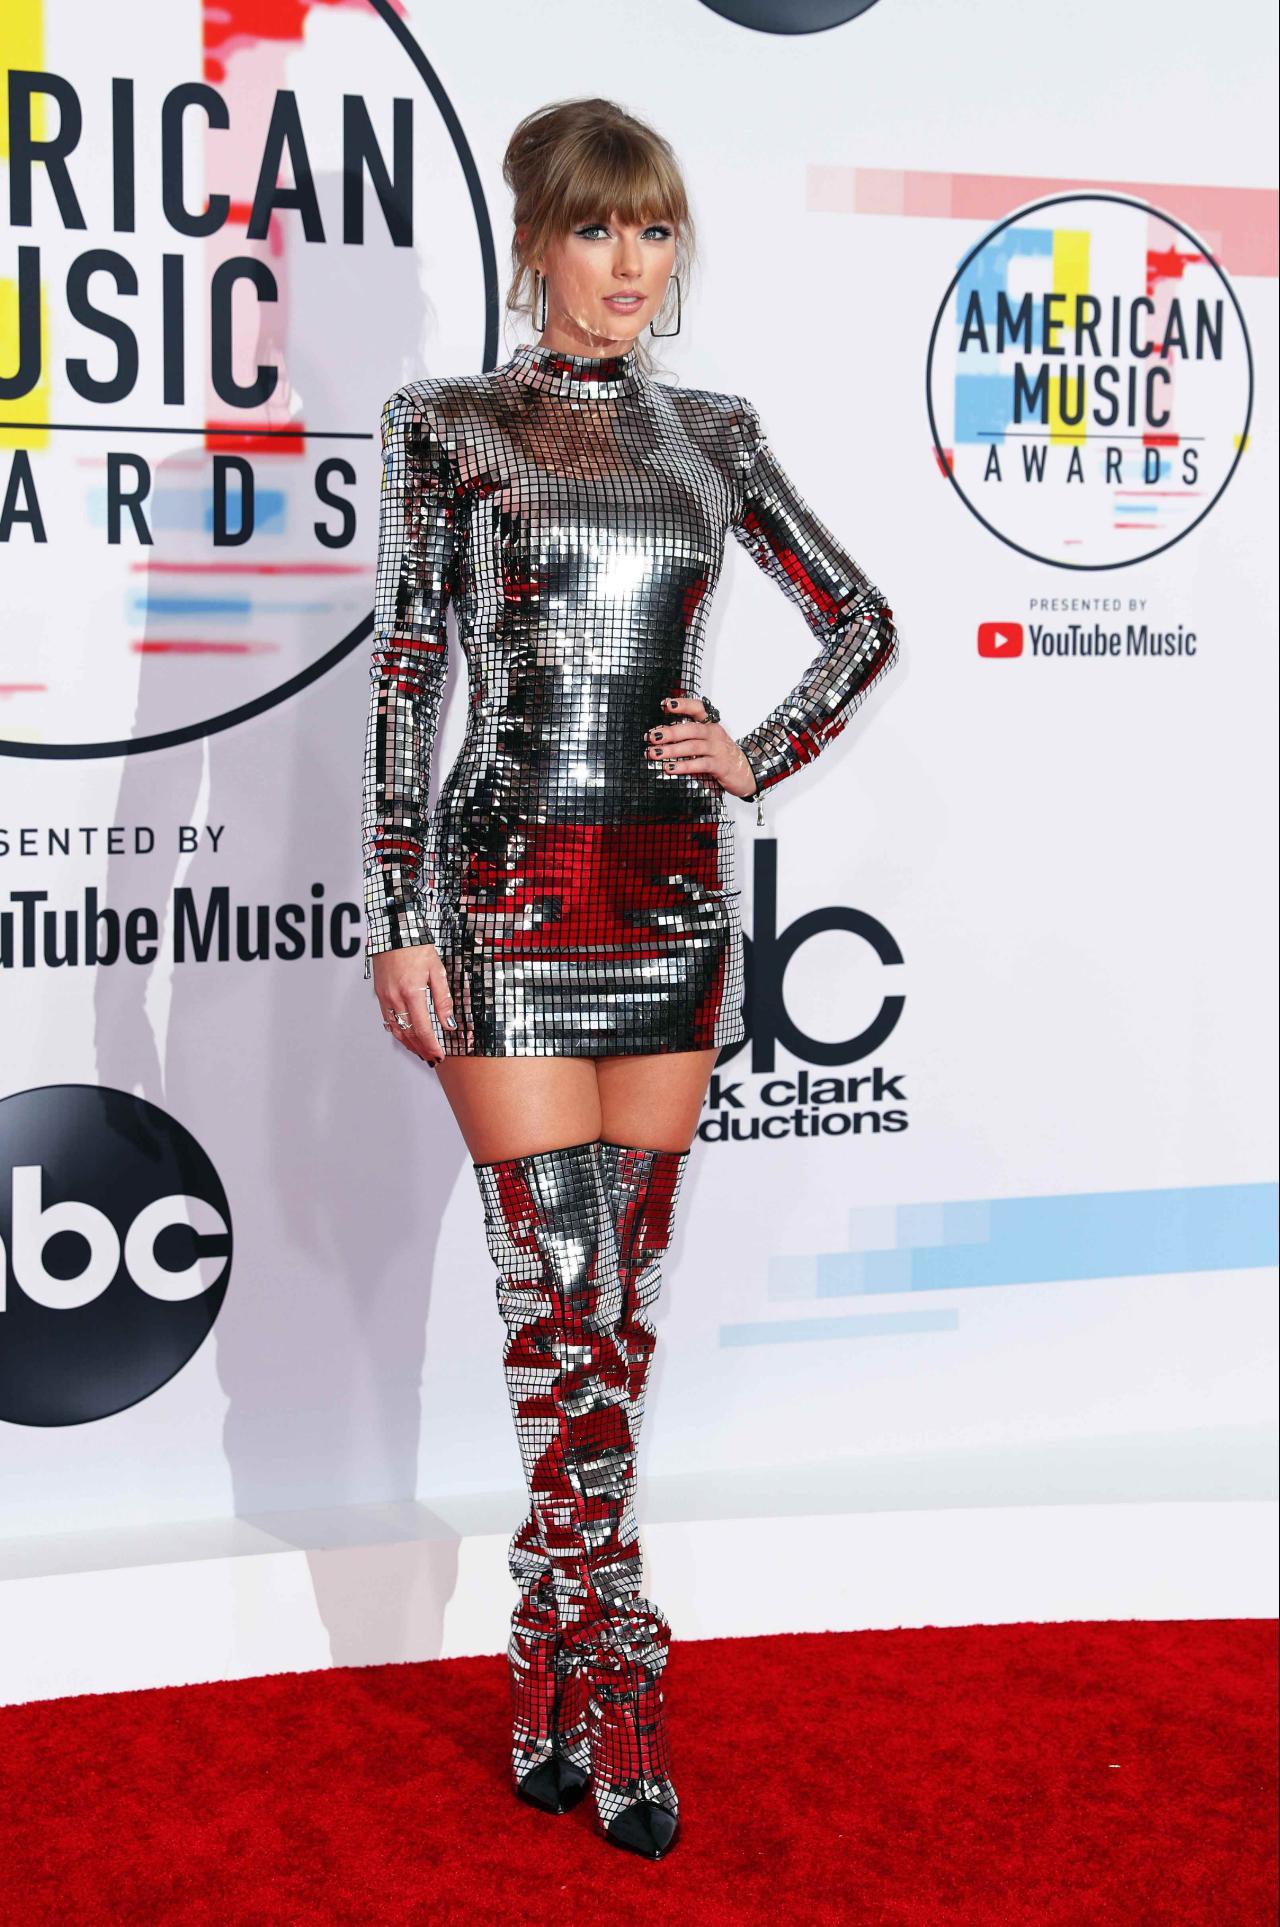 Taylor Swift recorre a tecnologia inovadora para apanhar stalkers nos concertos